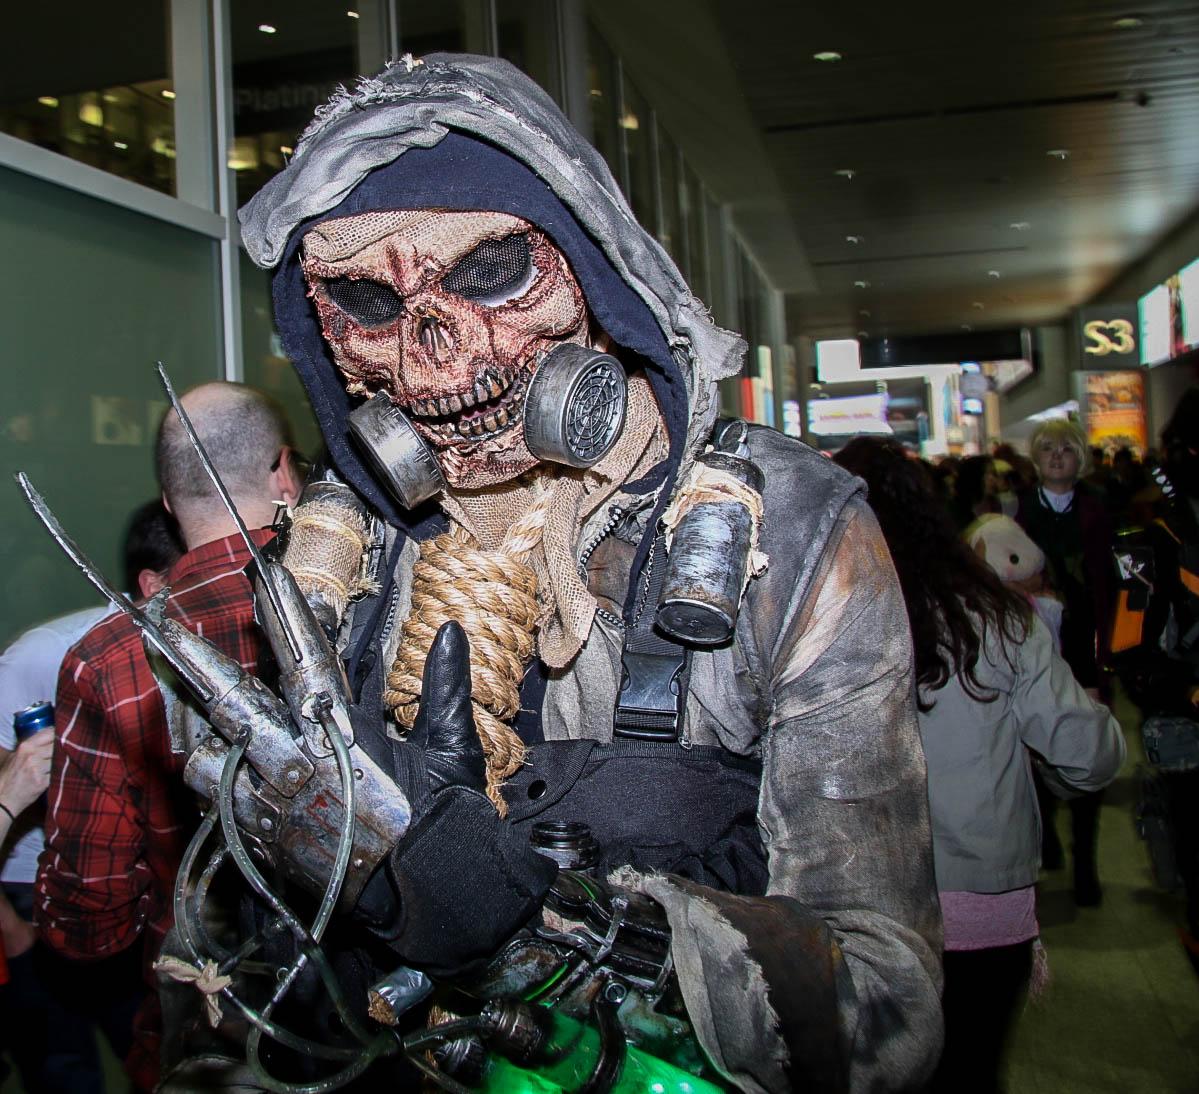 File:Scarecrow Batman Cosplay - MCM Comic Con 2016 (27398644855).jpg - Wikimedia Commons